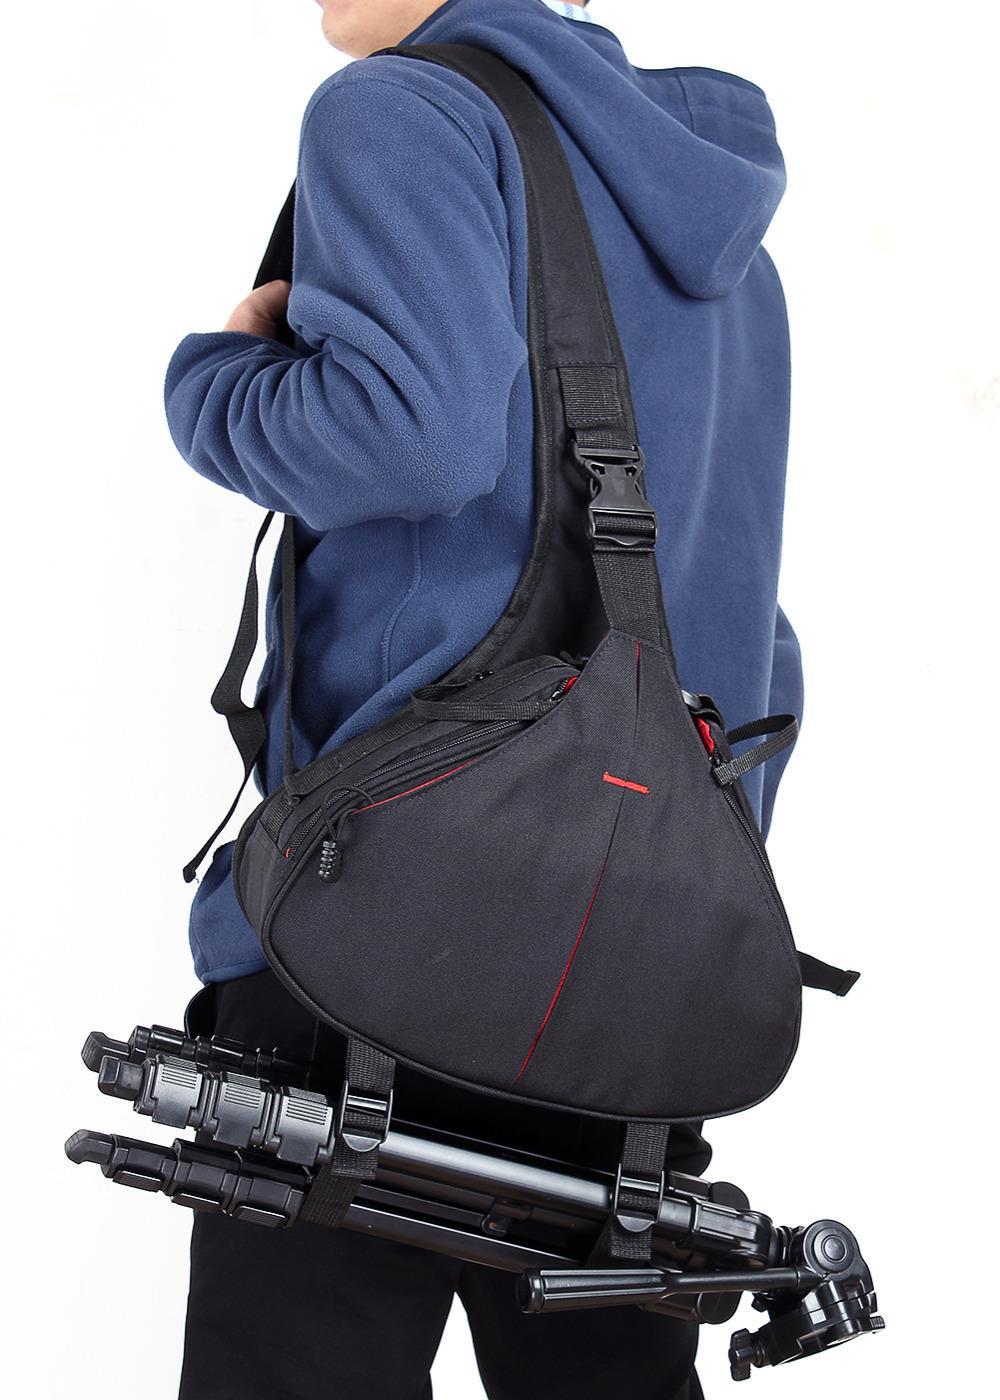 Black Diagonal DSLR SLR Digital Camera Bag Carry Case Shoulder Messenger For Nikon Sony Canon Free Shipping(China (Mainland))